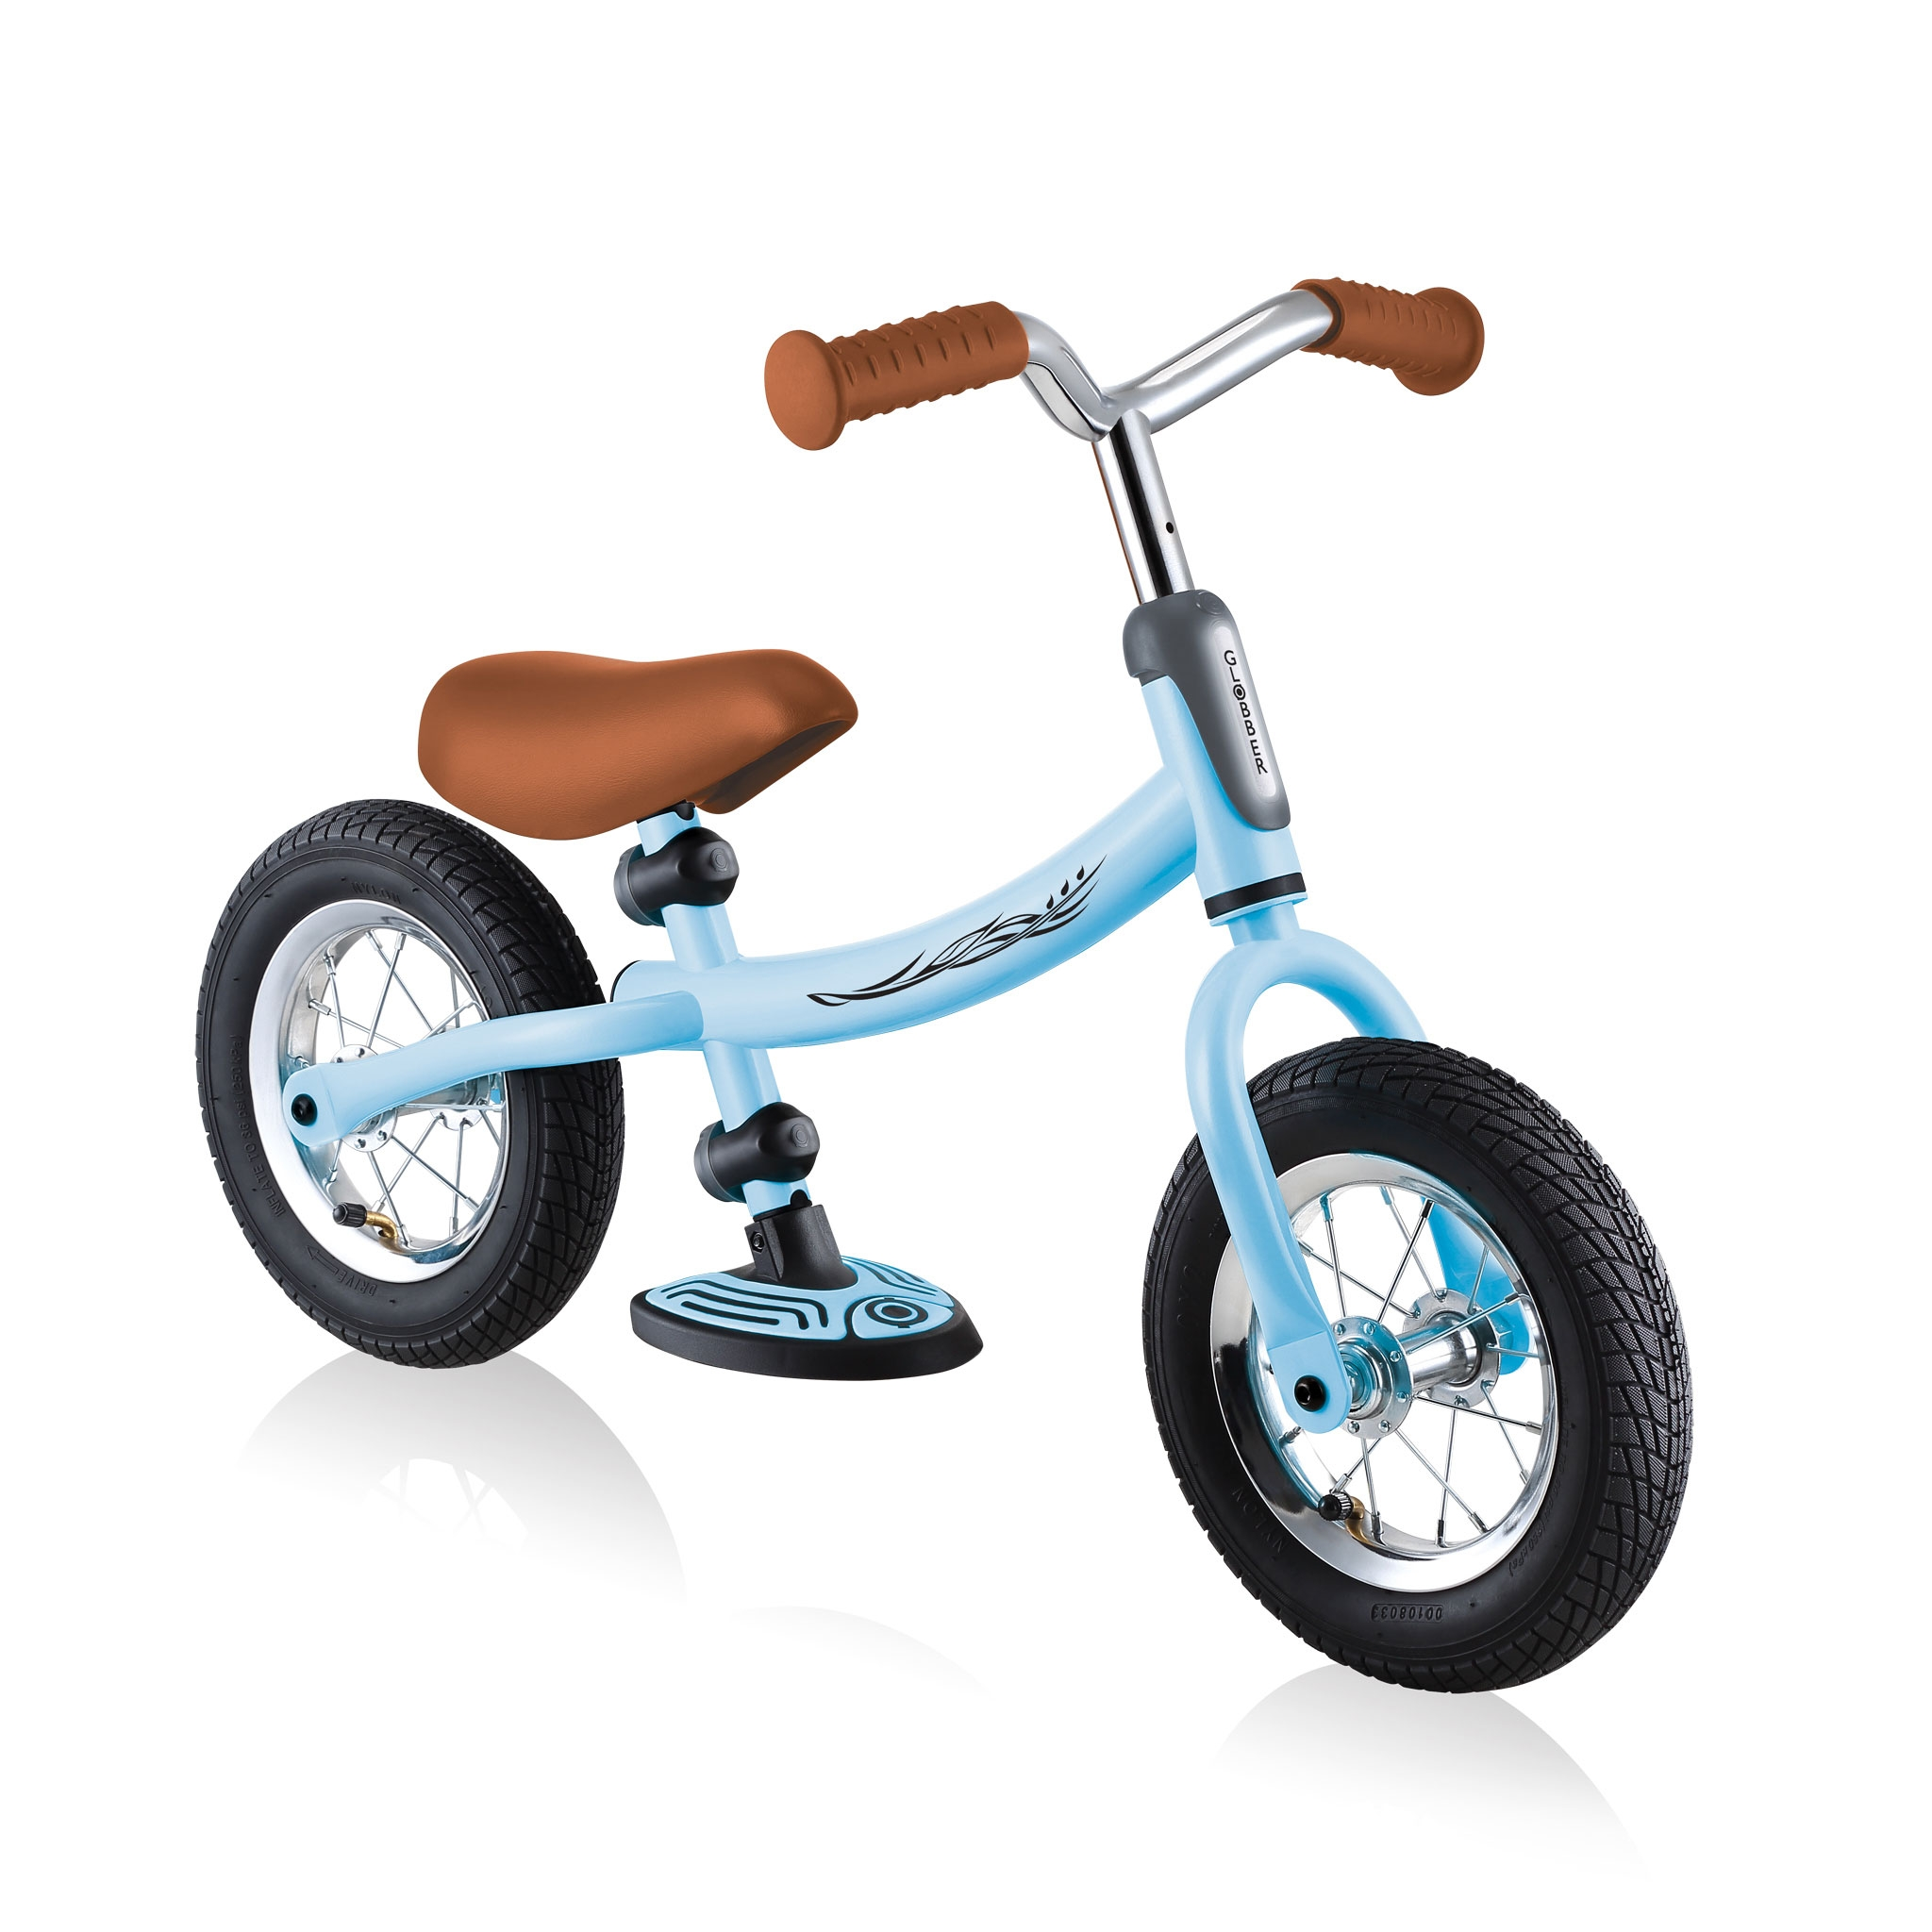 GO-BIKE-AIR-adjustable-toddler-balance-bike-with-reversible-frame 0